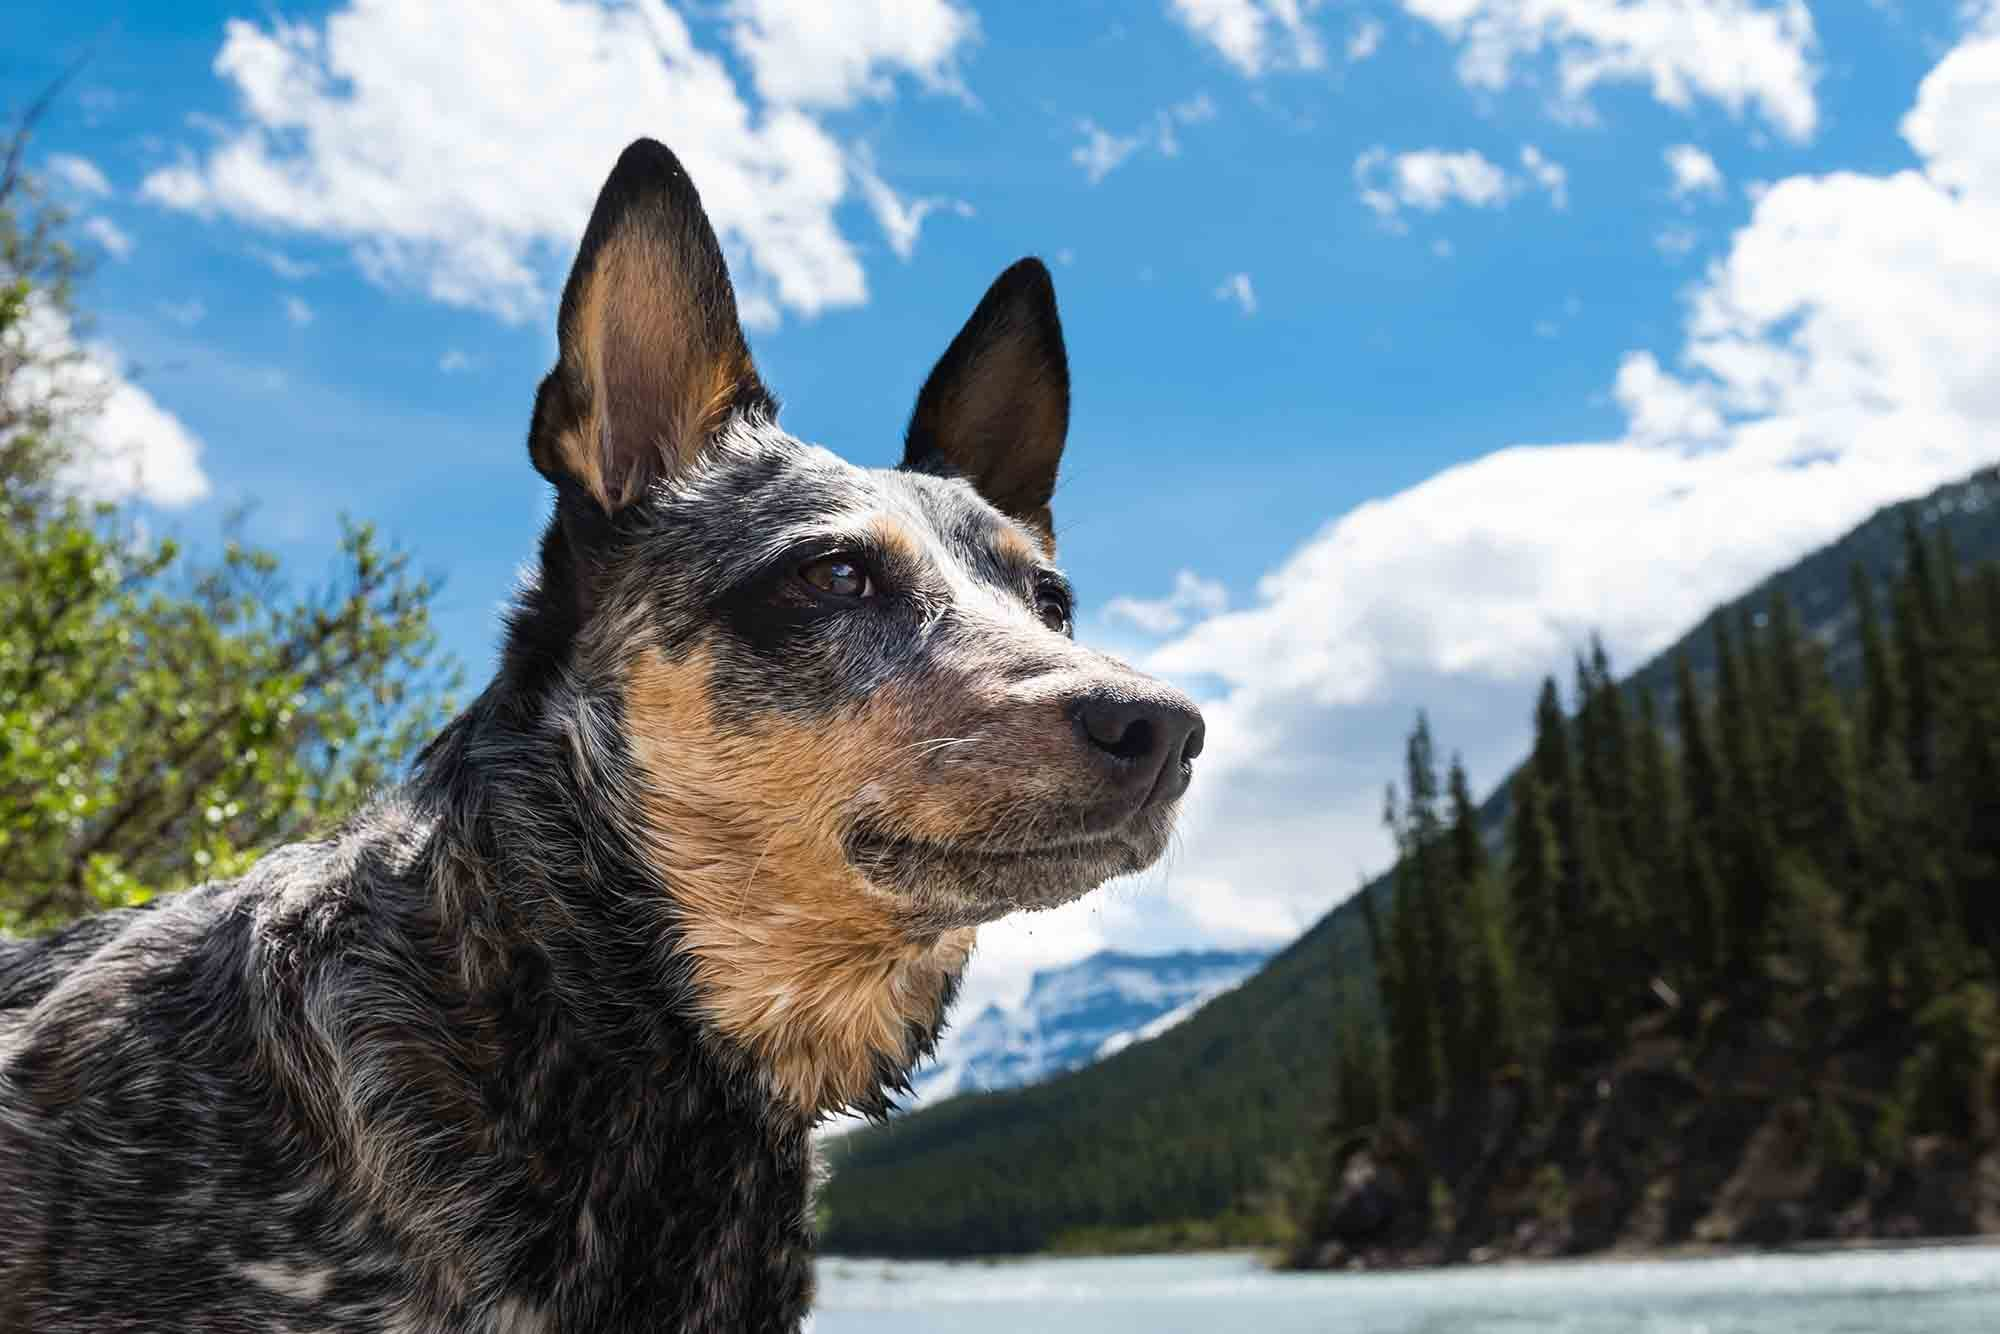 homing sense in dogs